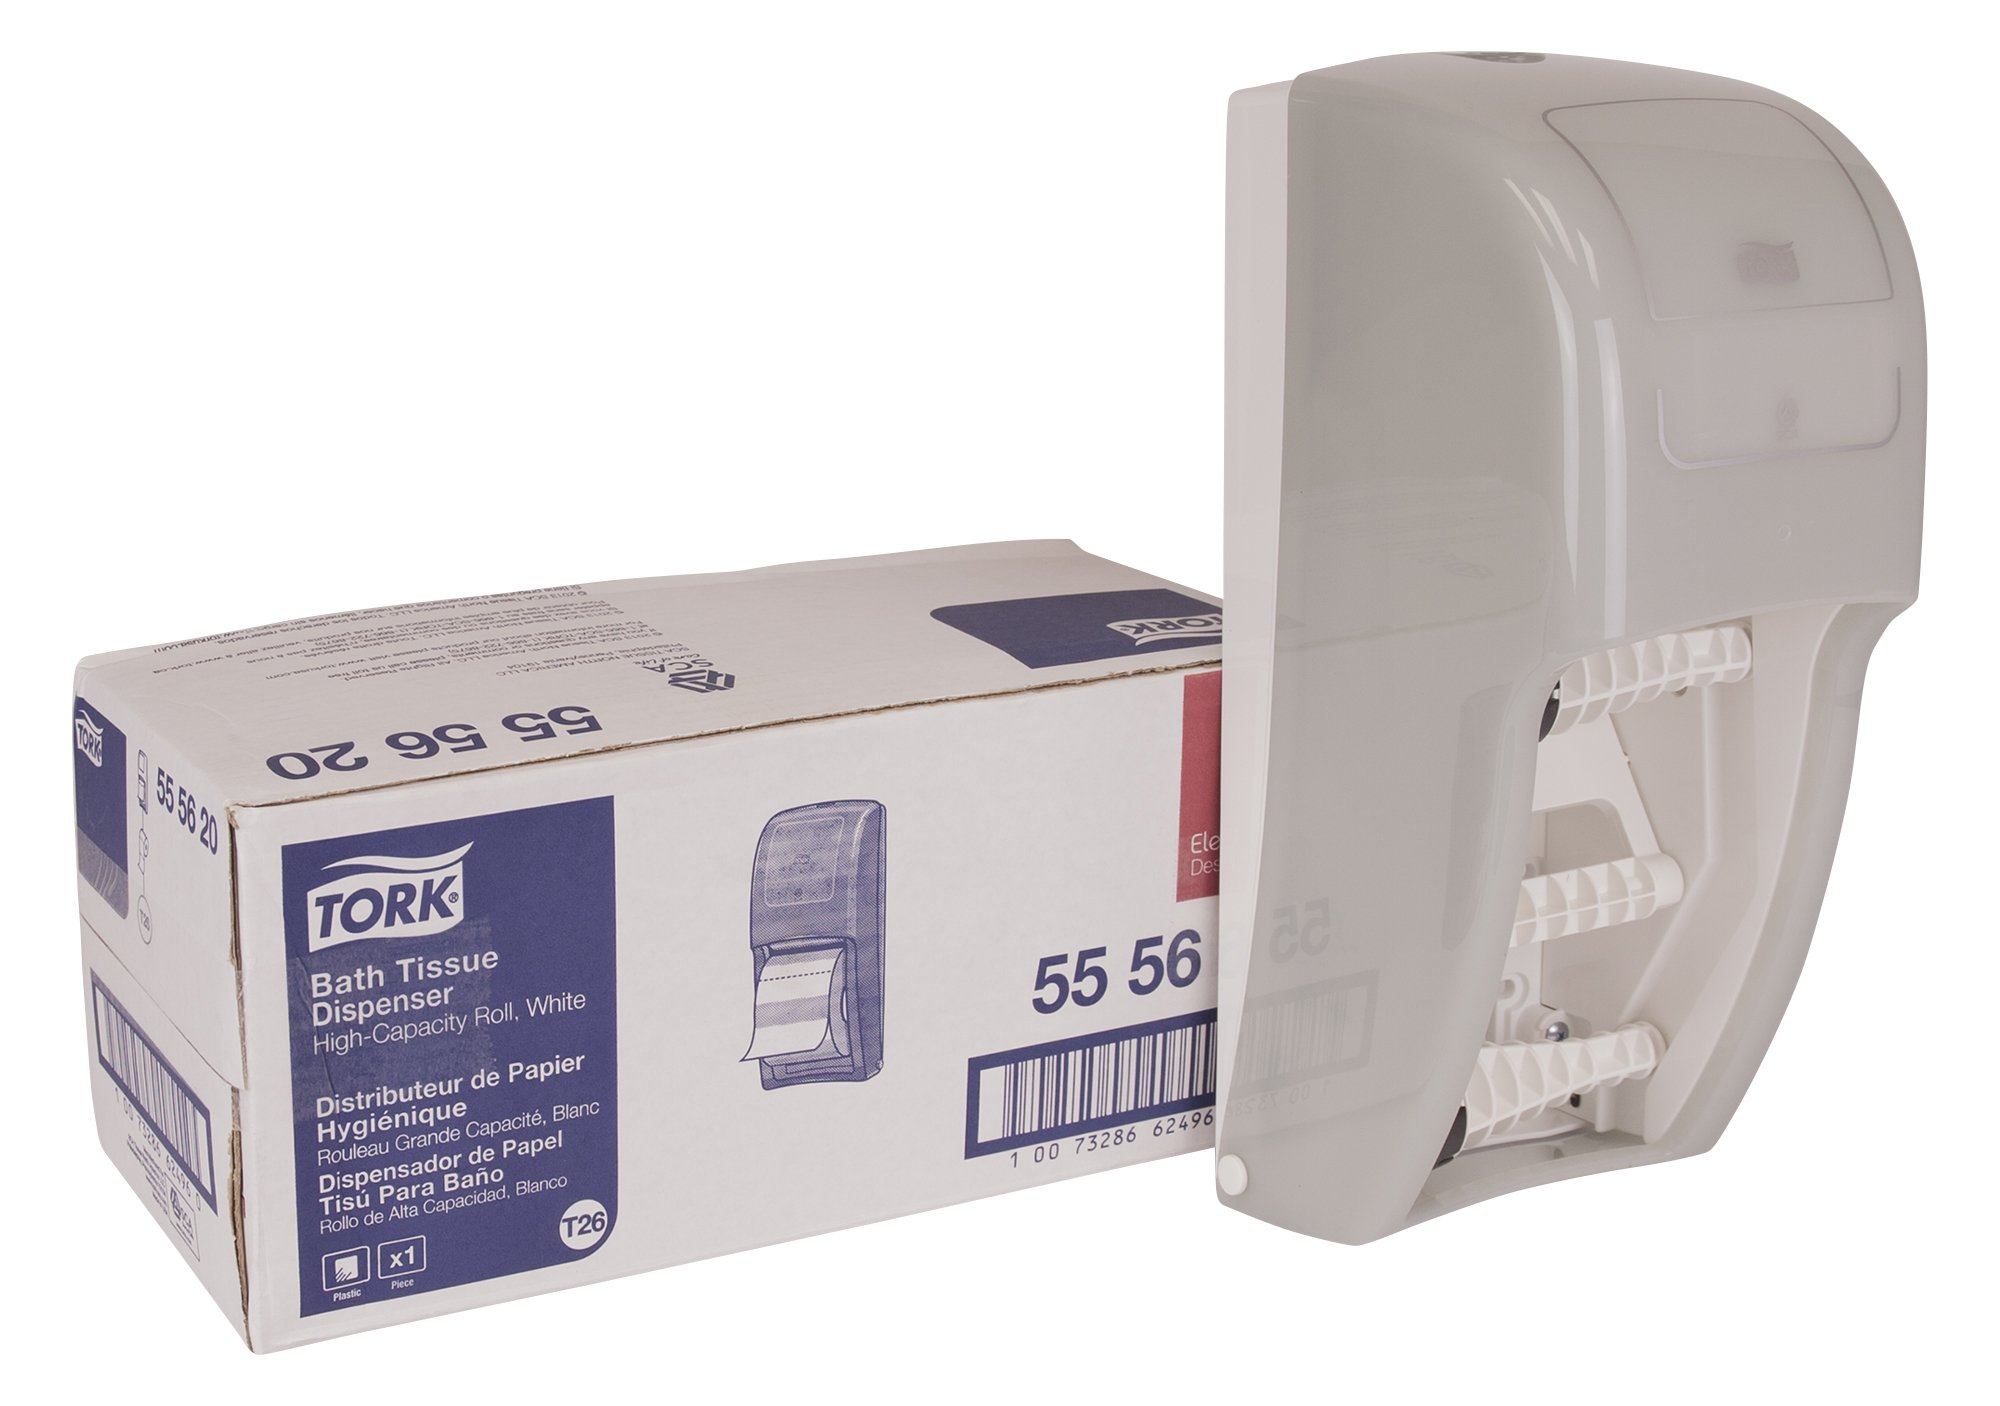 Tork 555620 Elevation High Capacity Bath Tissue Dispenser